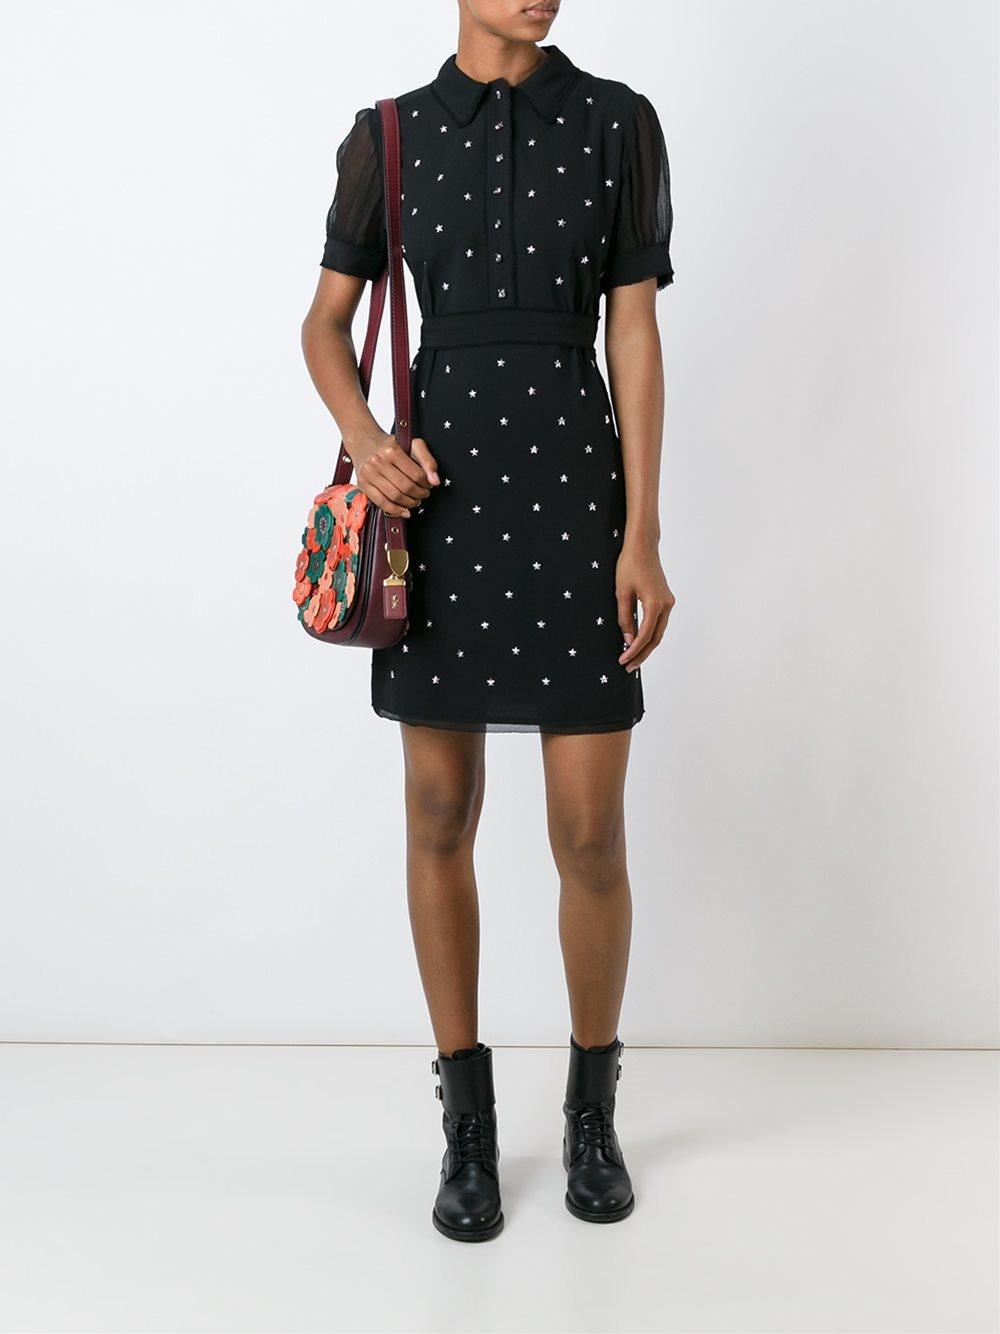 Lyst coach star stud embellished dress in black for Dress shirt studs uk